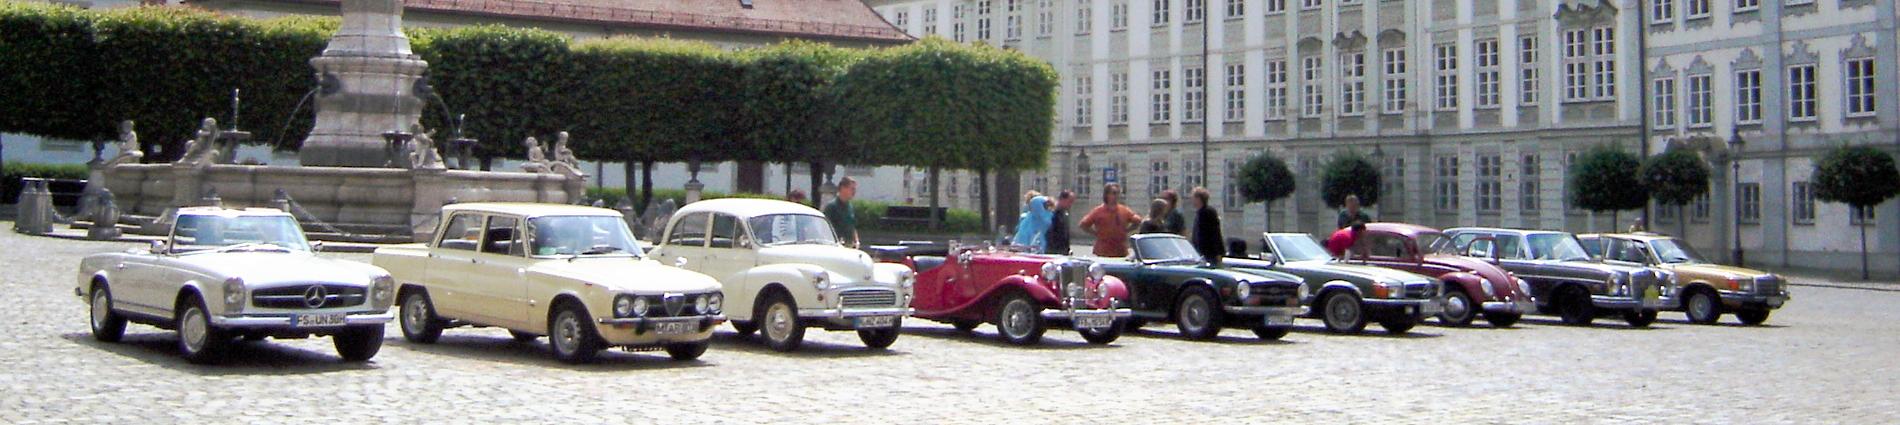 Oldtimerfreunde Freising